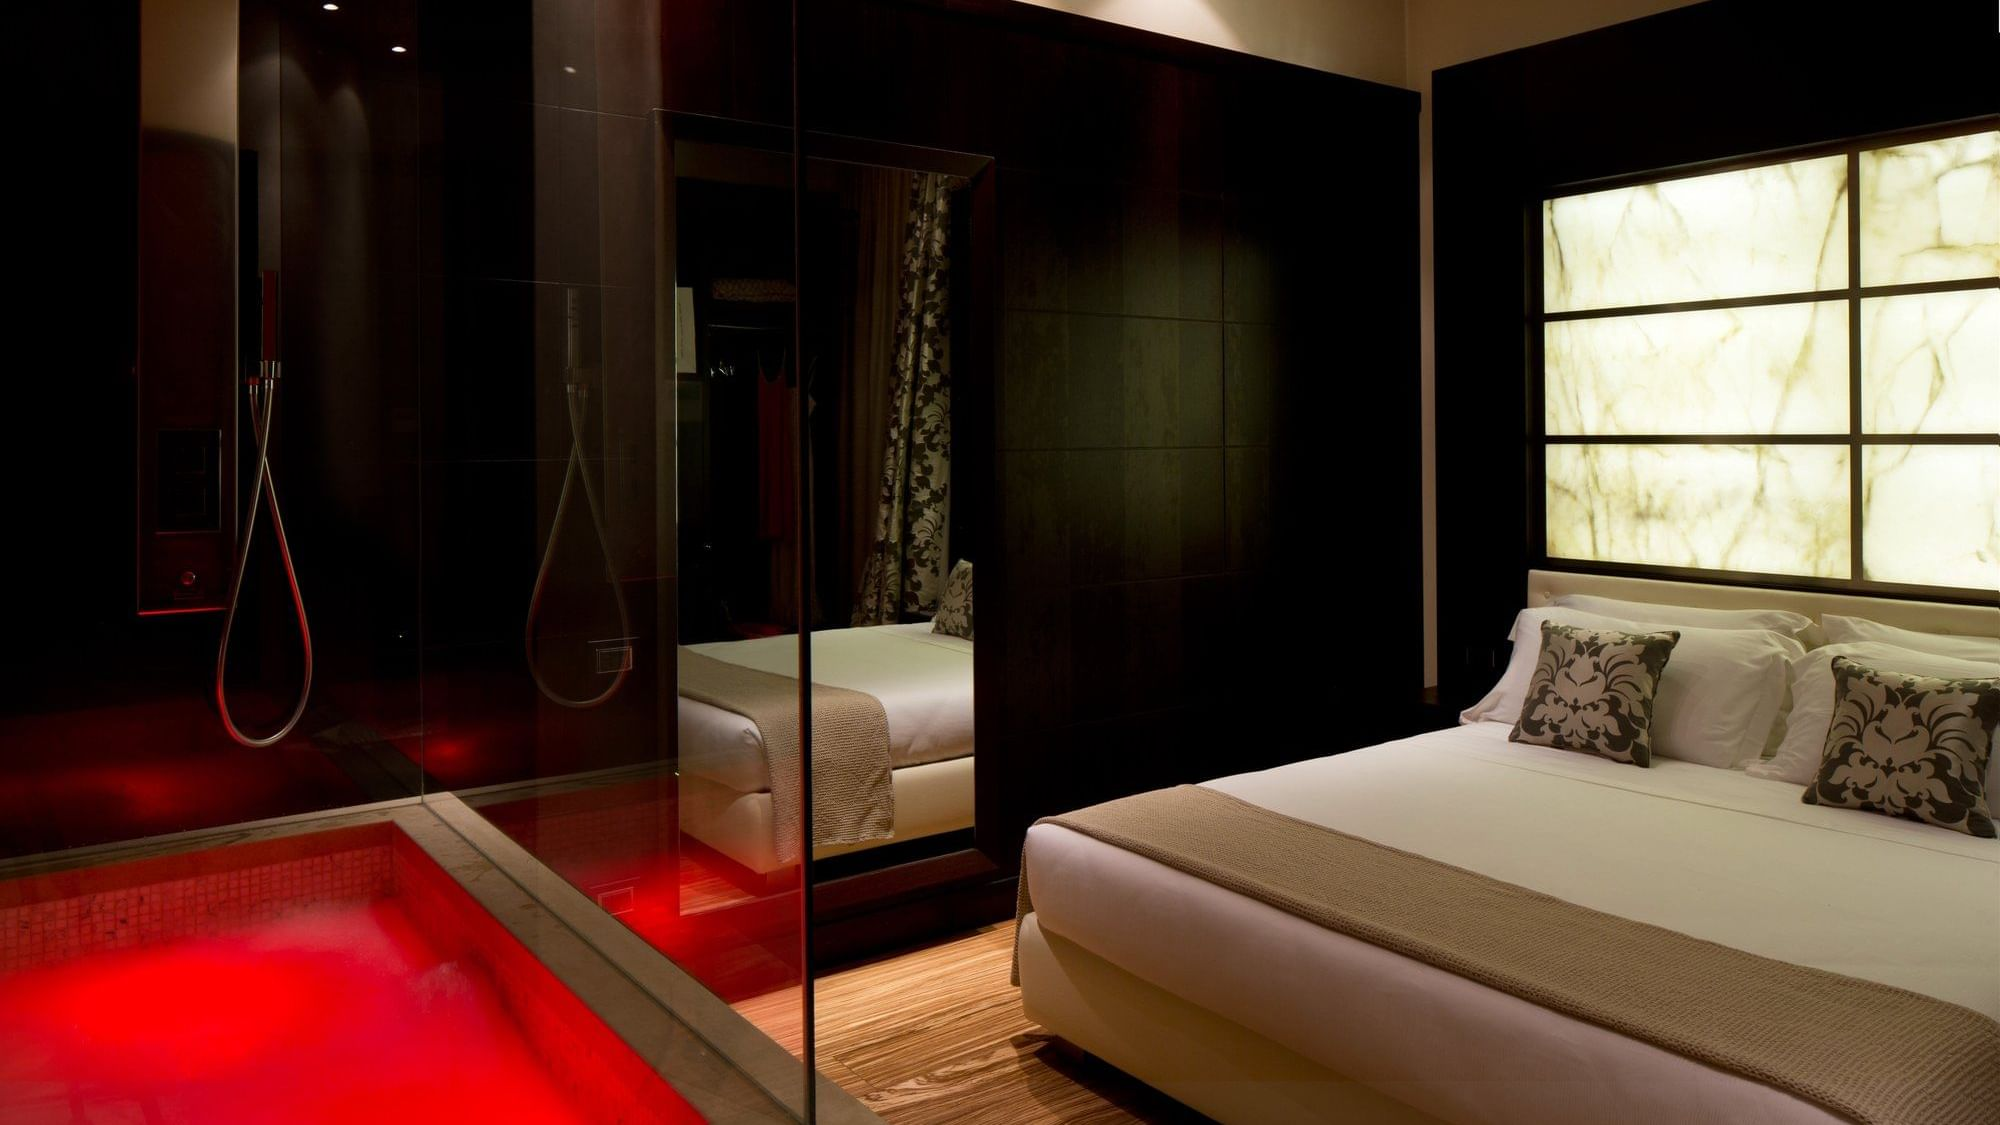 Appartamento Luxury a Firenze, in Toscana